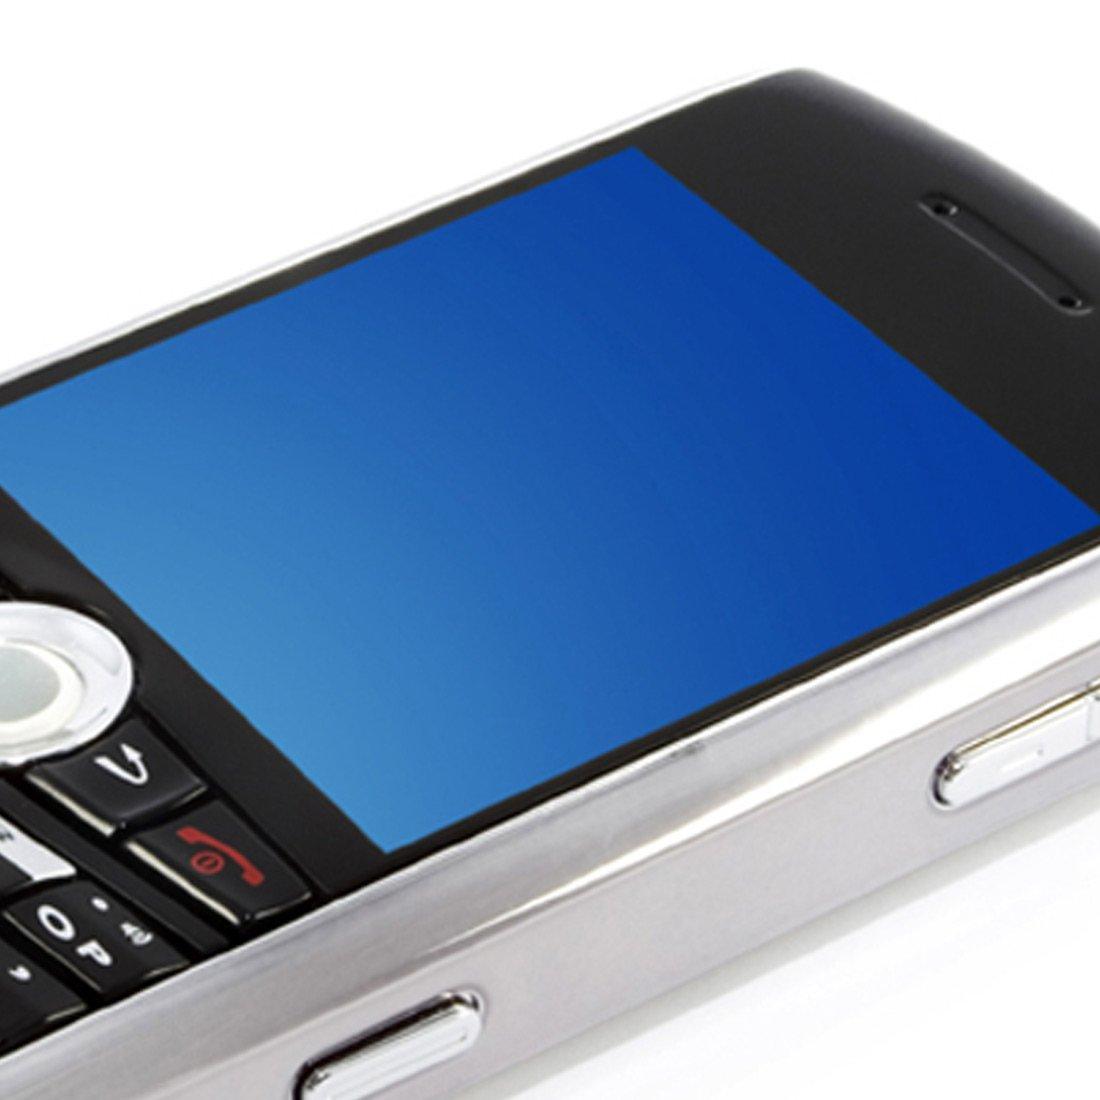 Blackberry pearl 8100 mobile phones images blackberry pearl 8100 - Blackberry Pearl 8100 Sim Free Smartphone Black Amazon Co Uk Electronics